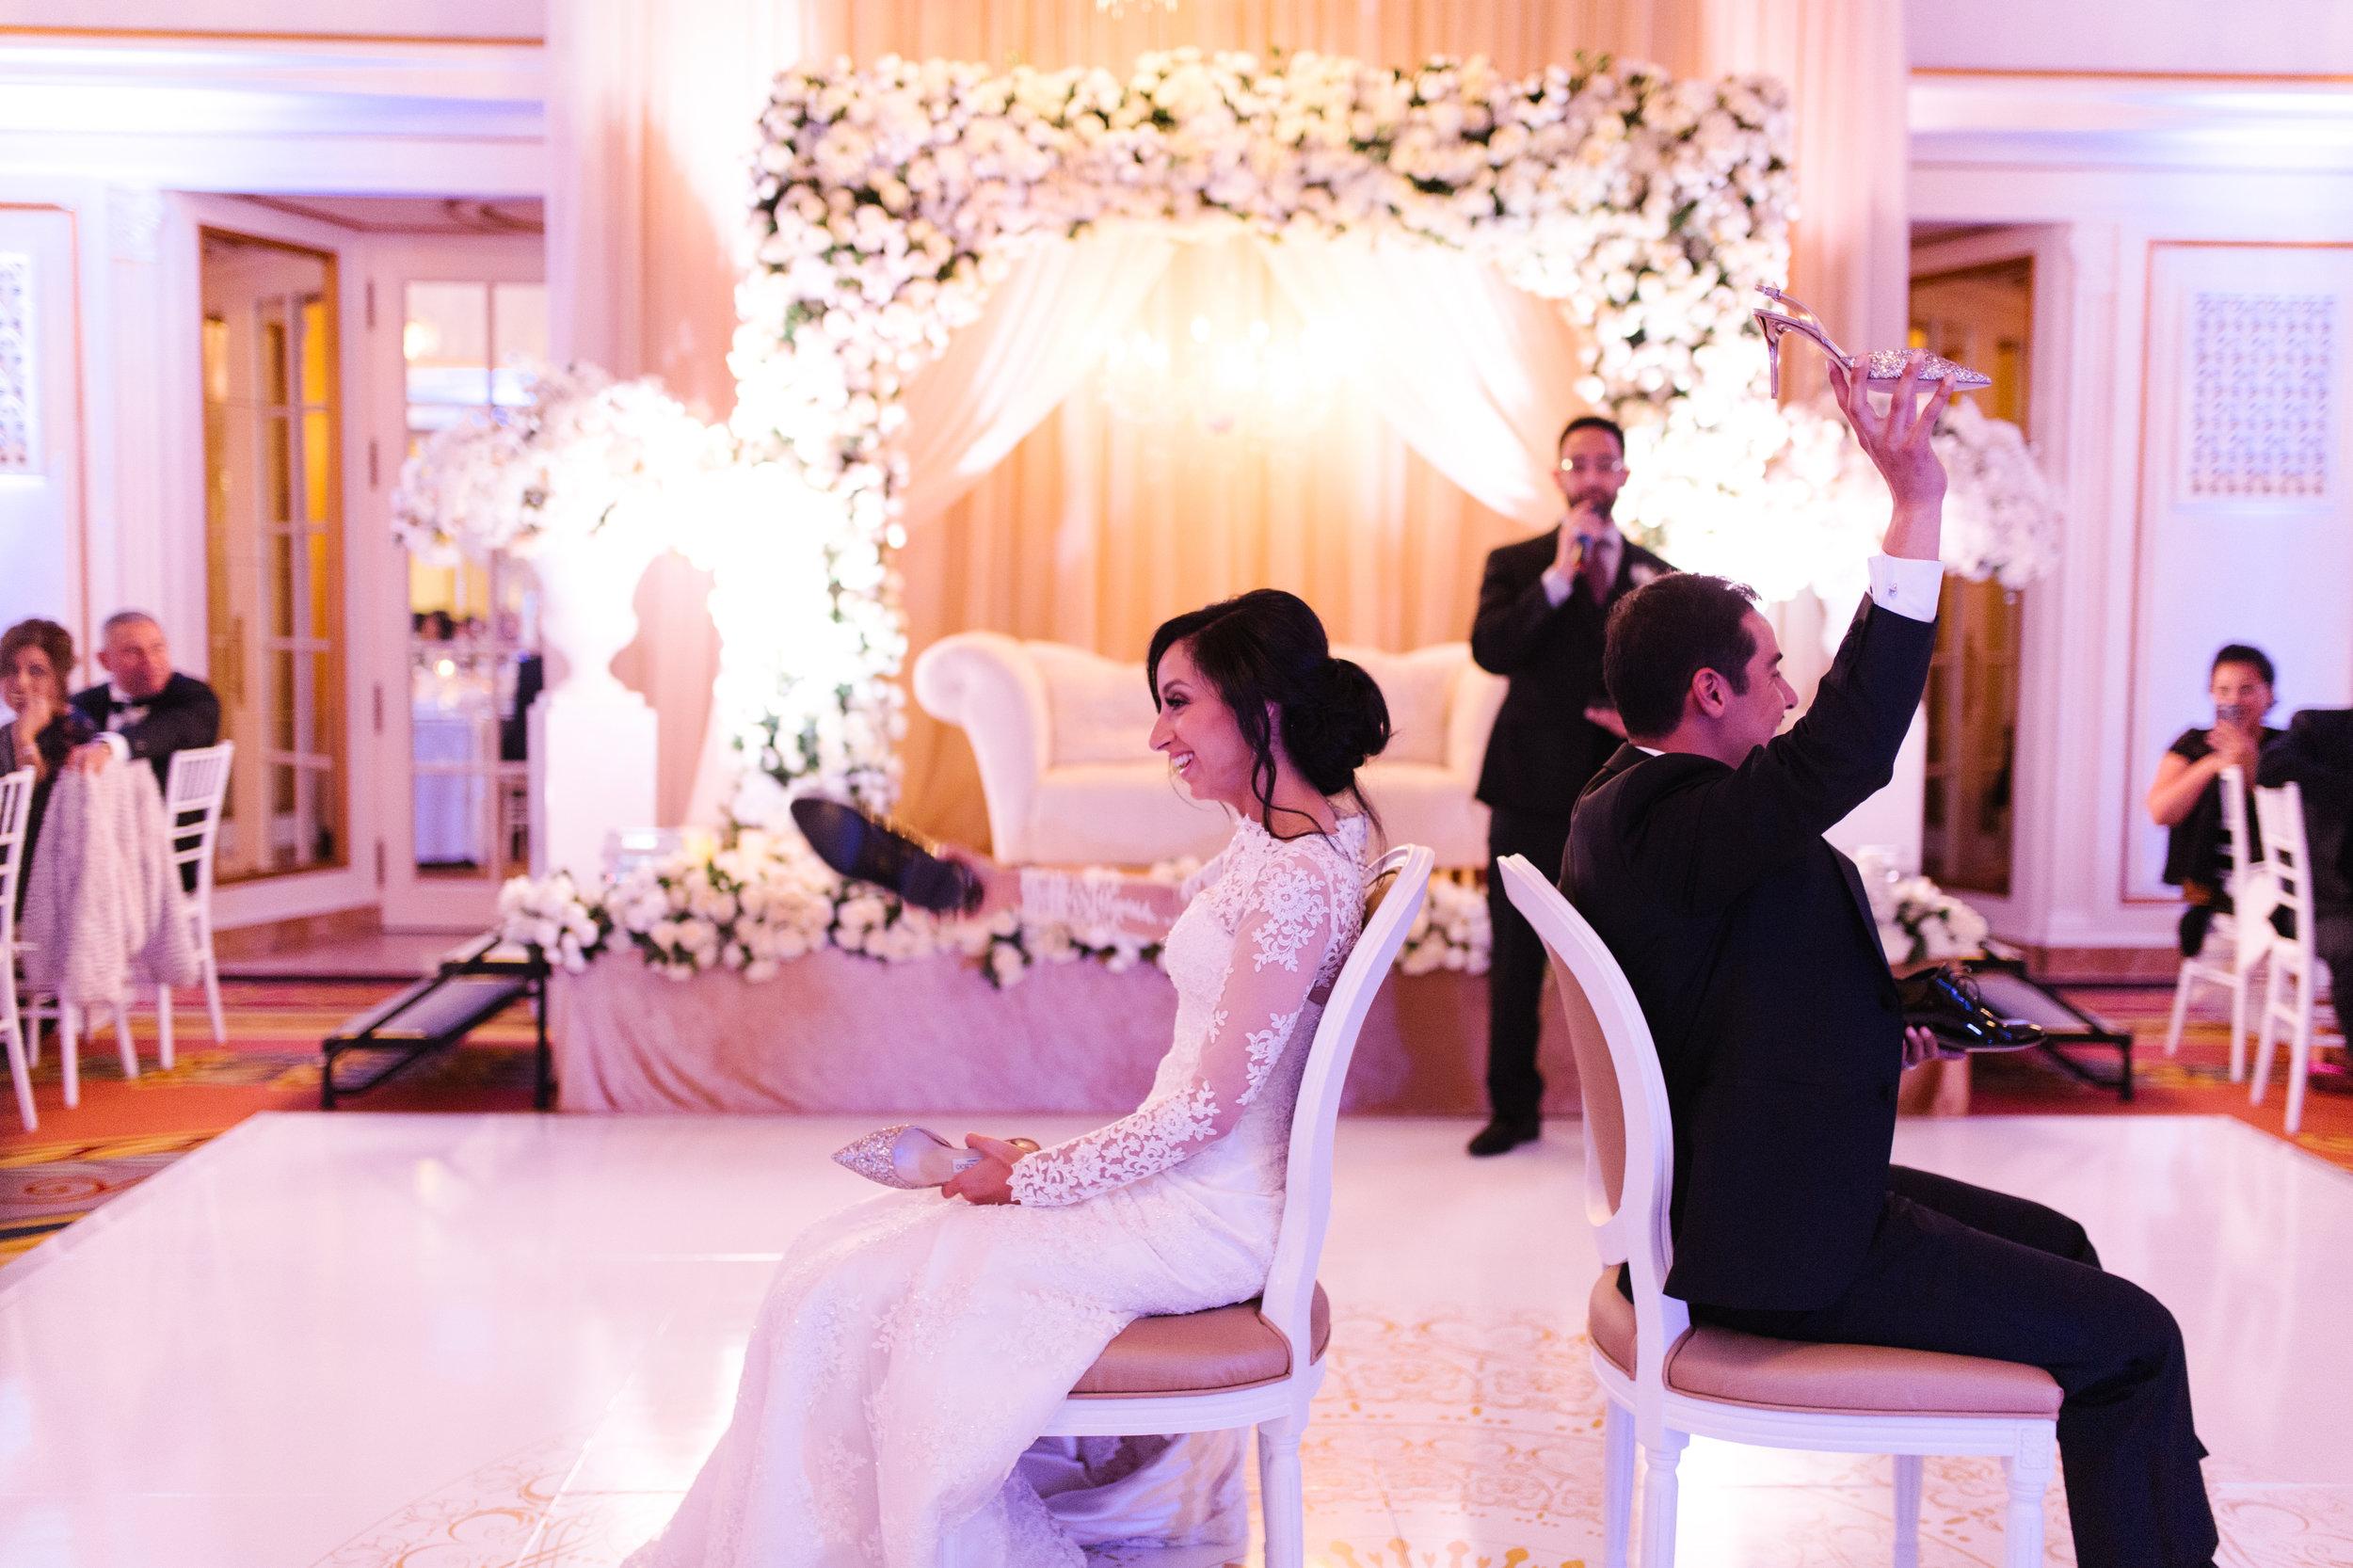 herafilms_wedding_shima_jose_hera_selects-48.jpg